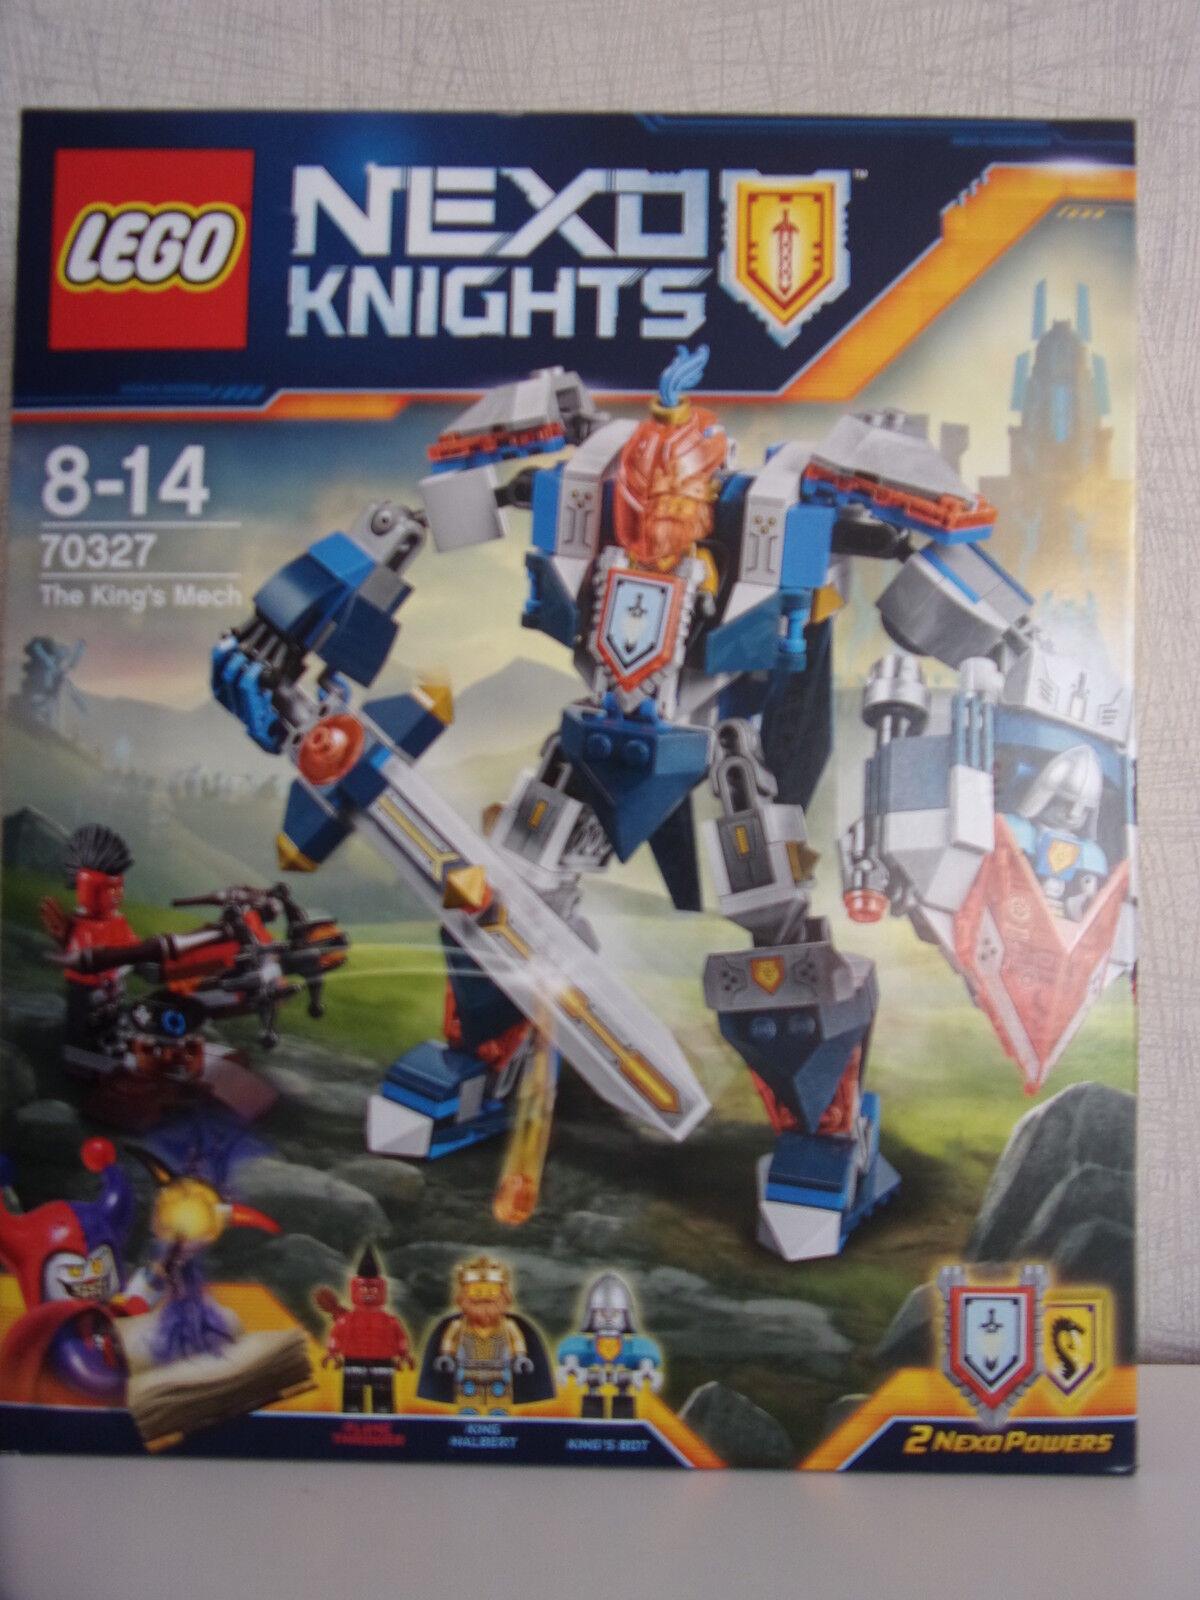 Lego Nexo Knights 70327 (la Mech du roi) - NEUF & neuf dans sa boîte